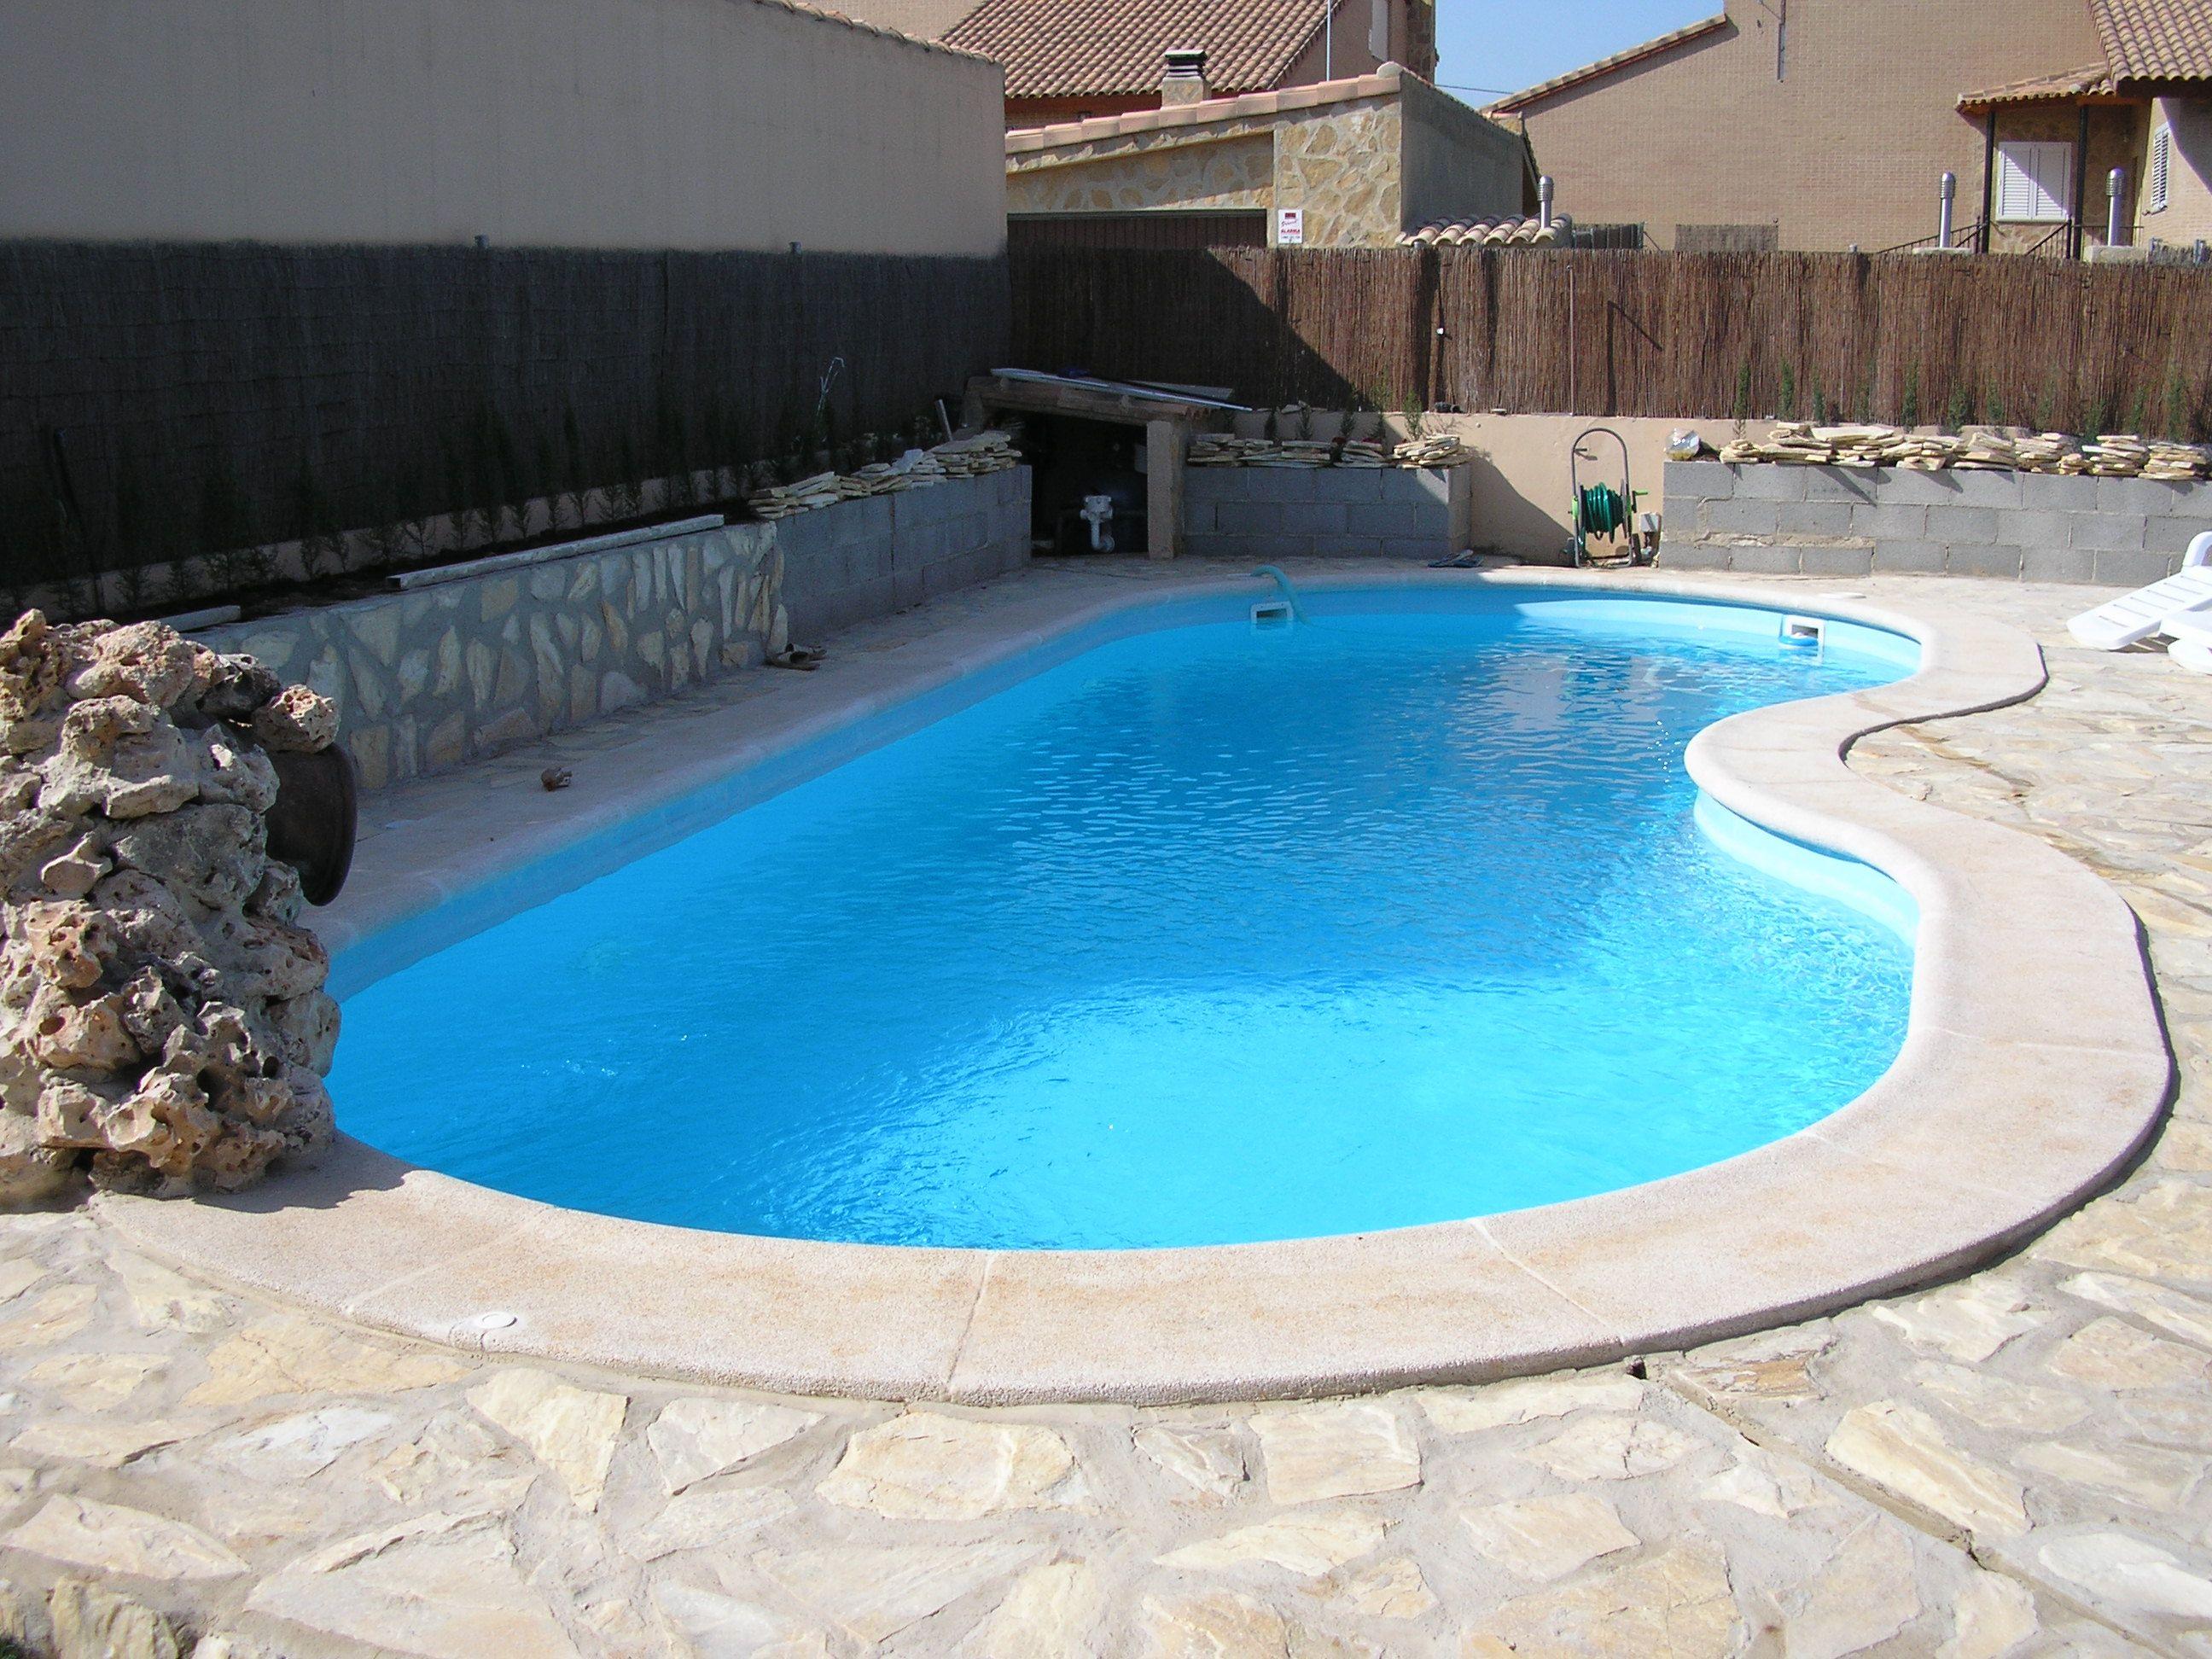 Piscina de poli ster piscinas pinterest piscinas for Vaso piscina